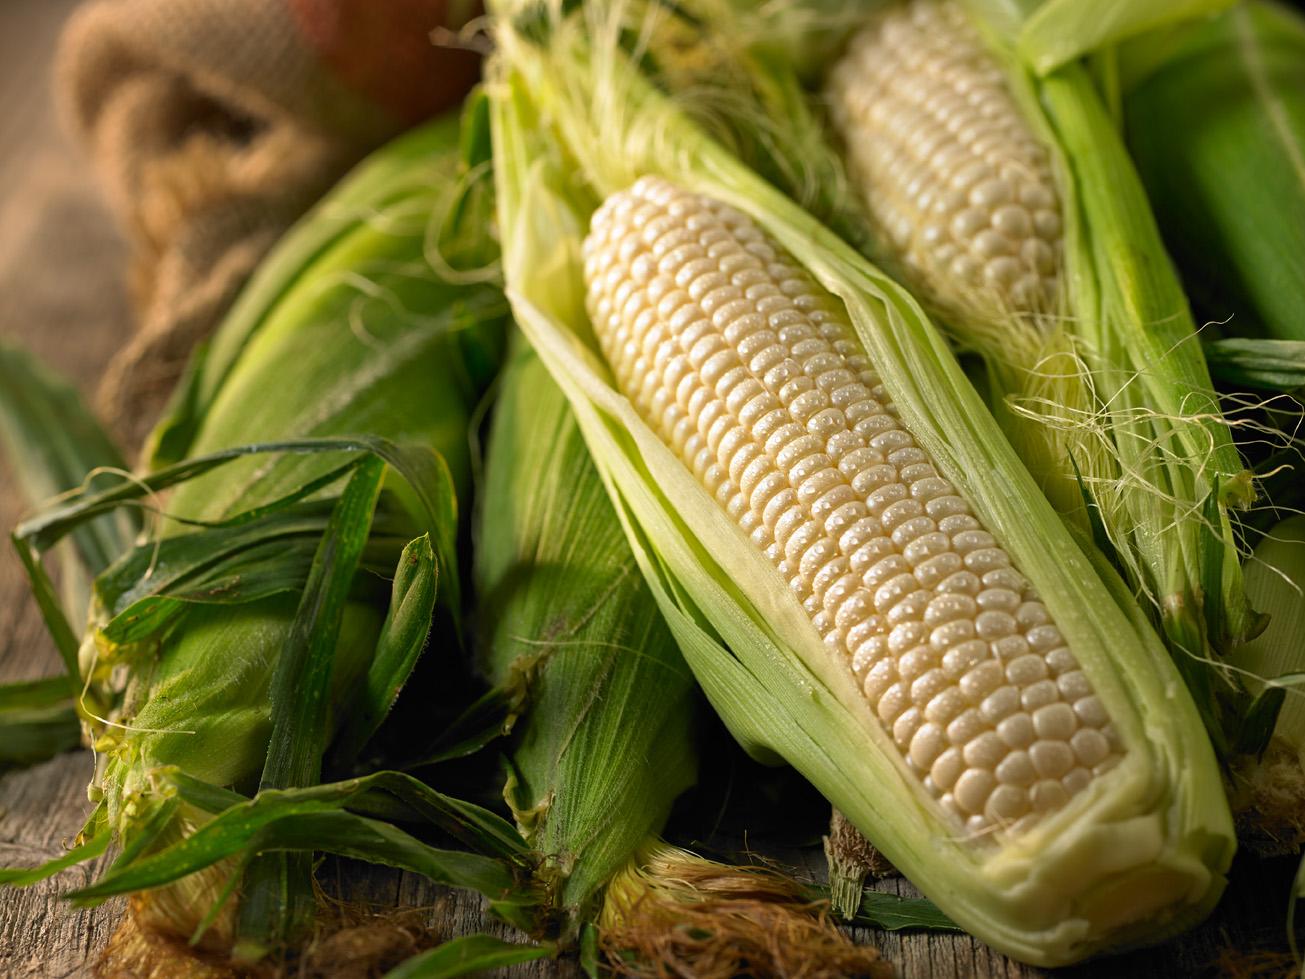 Amaize Sweet Corn: Amaize Sweet Corn